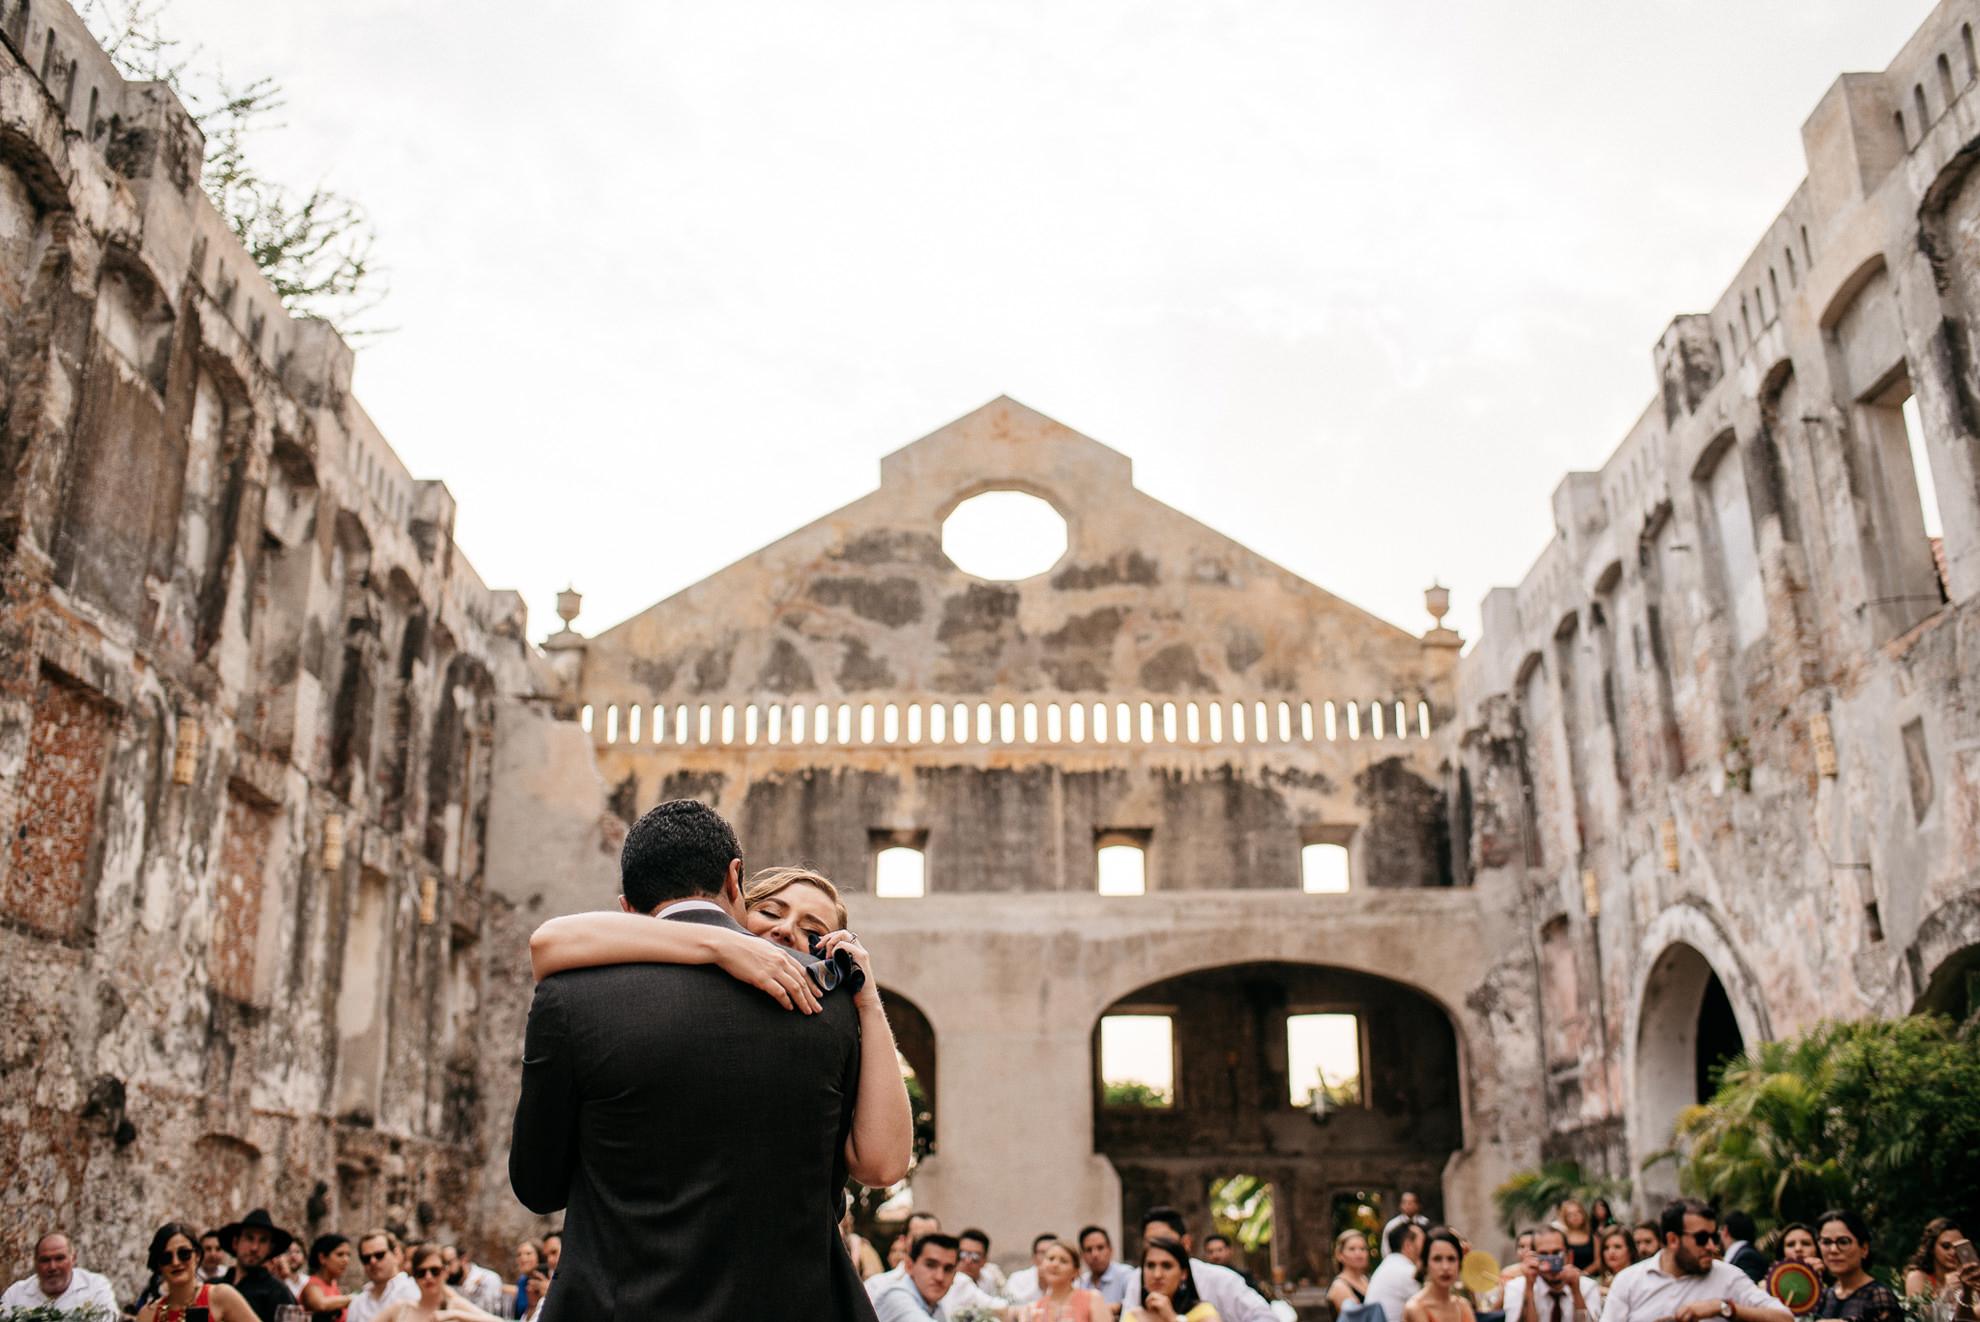 089 - hacienda san carlos.jpg